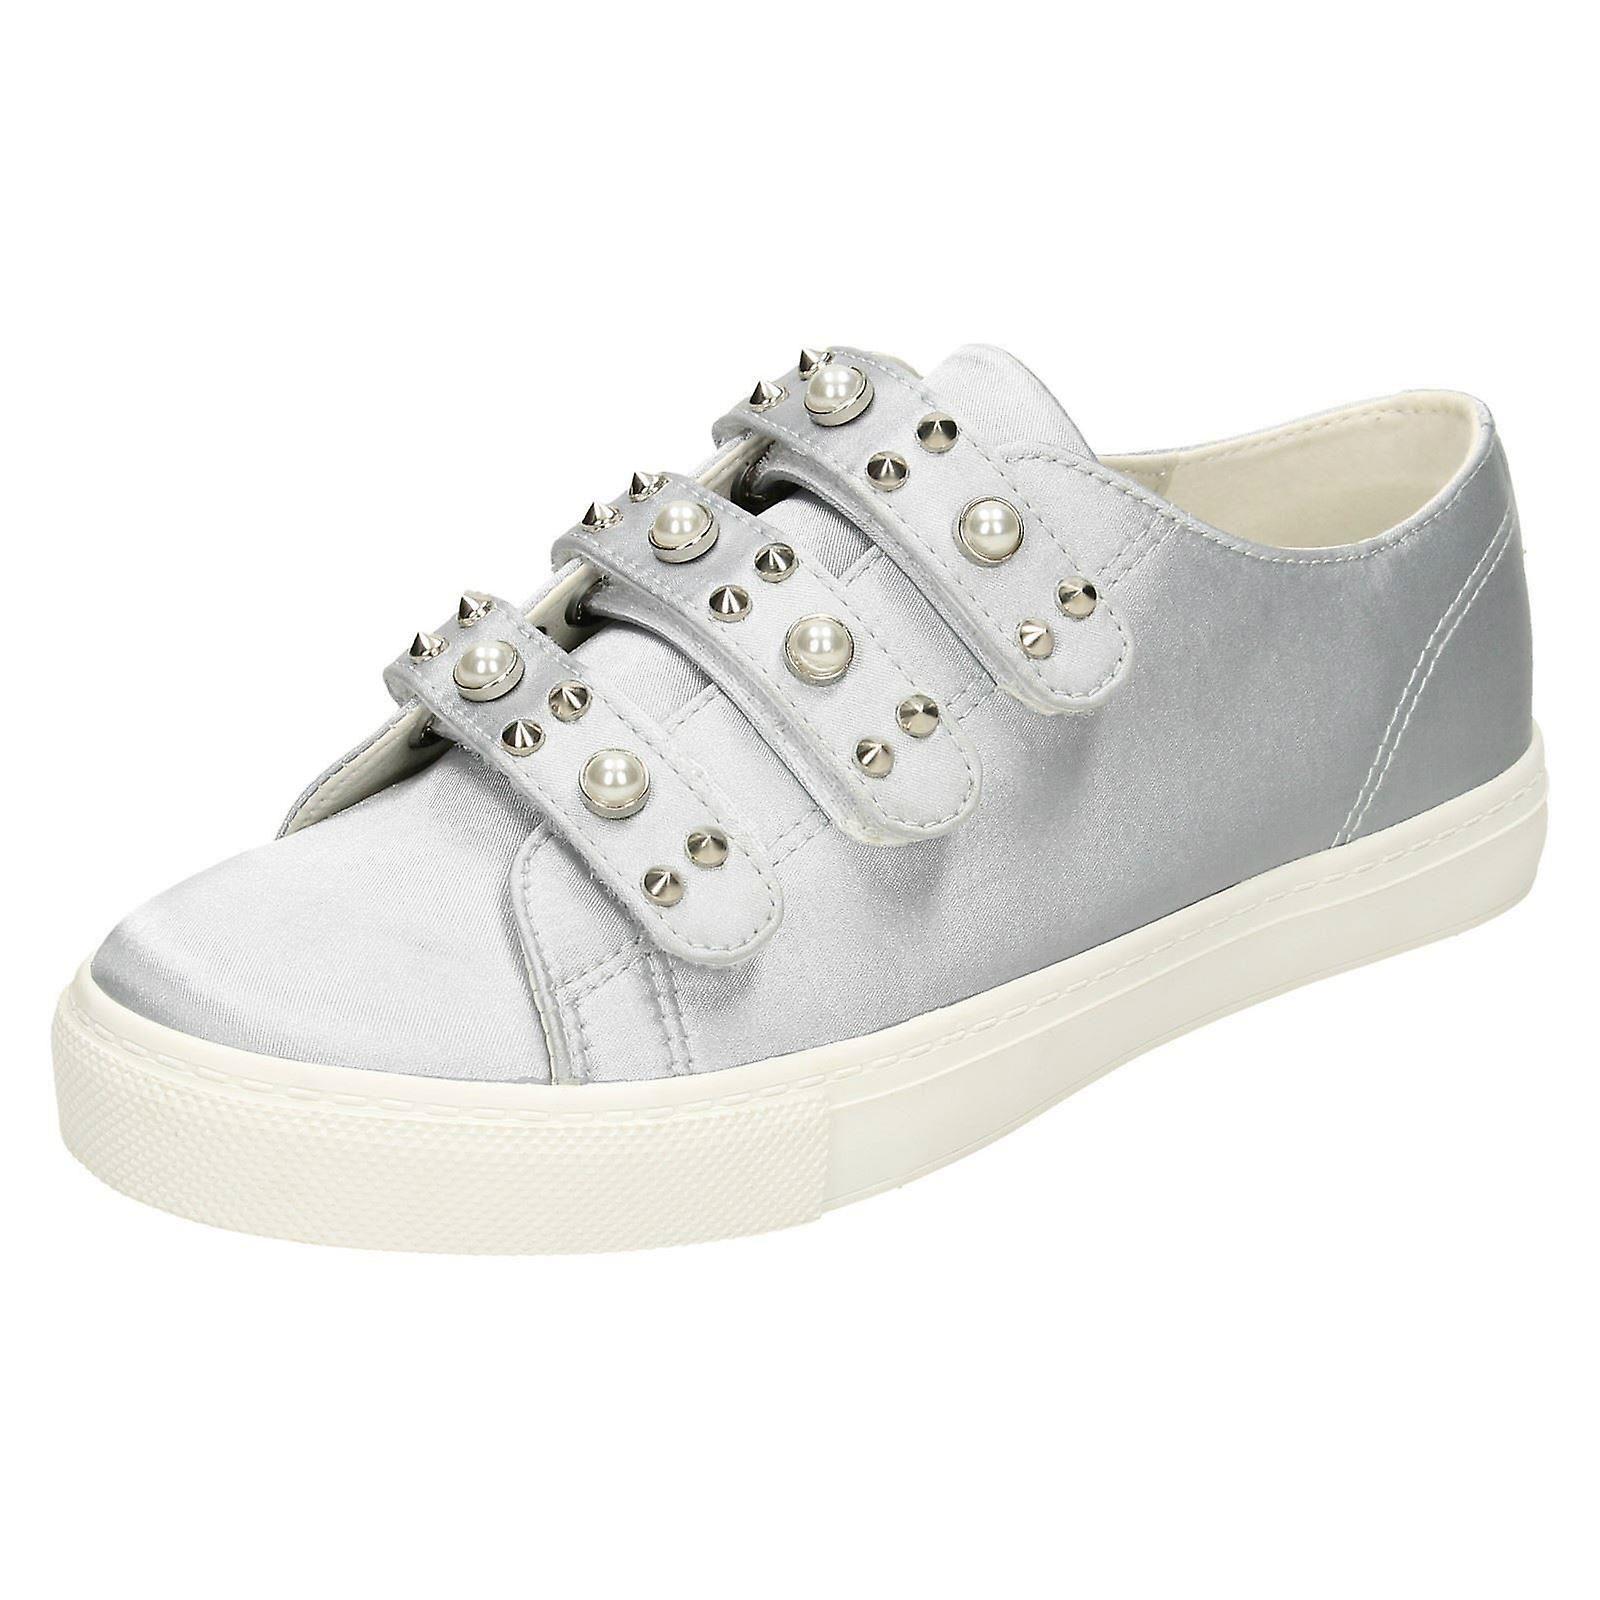 Damen-Fleck auf Perle Armband Schuhe F80359 - grau Satin - UK Größe 5 - EU Größe 38 - Größe 7